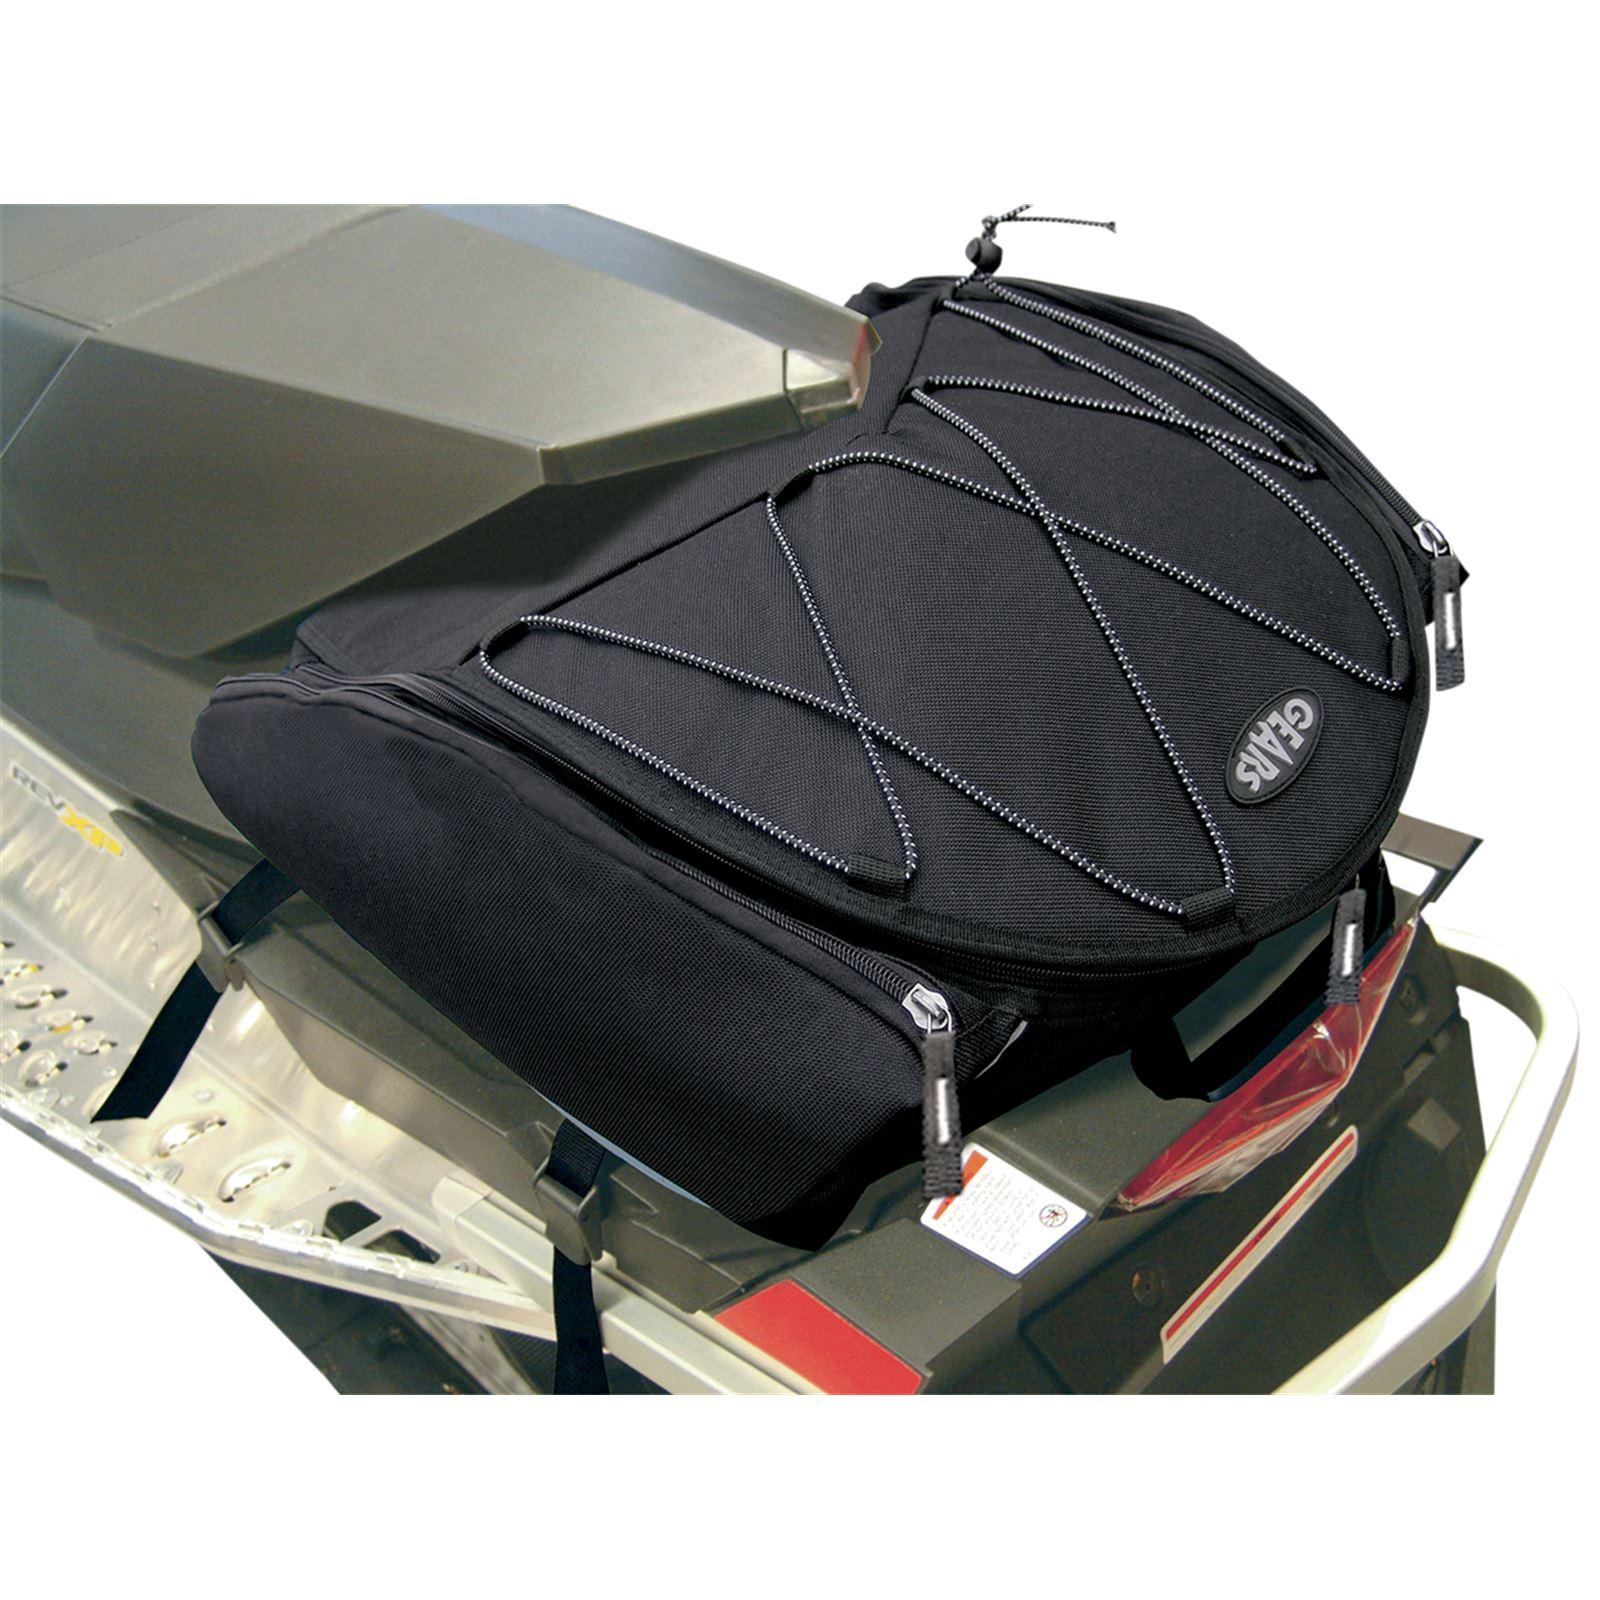 Gears Tunnel Bag